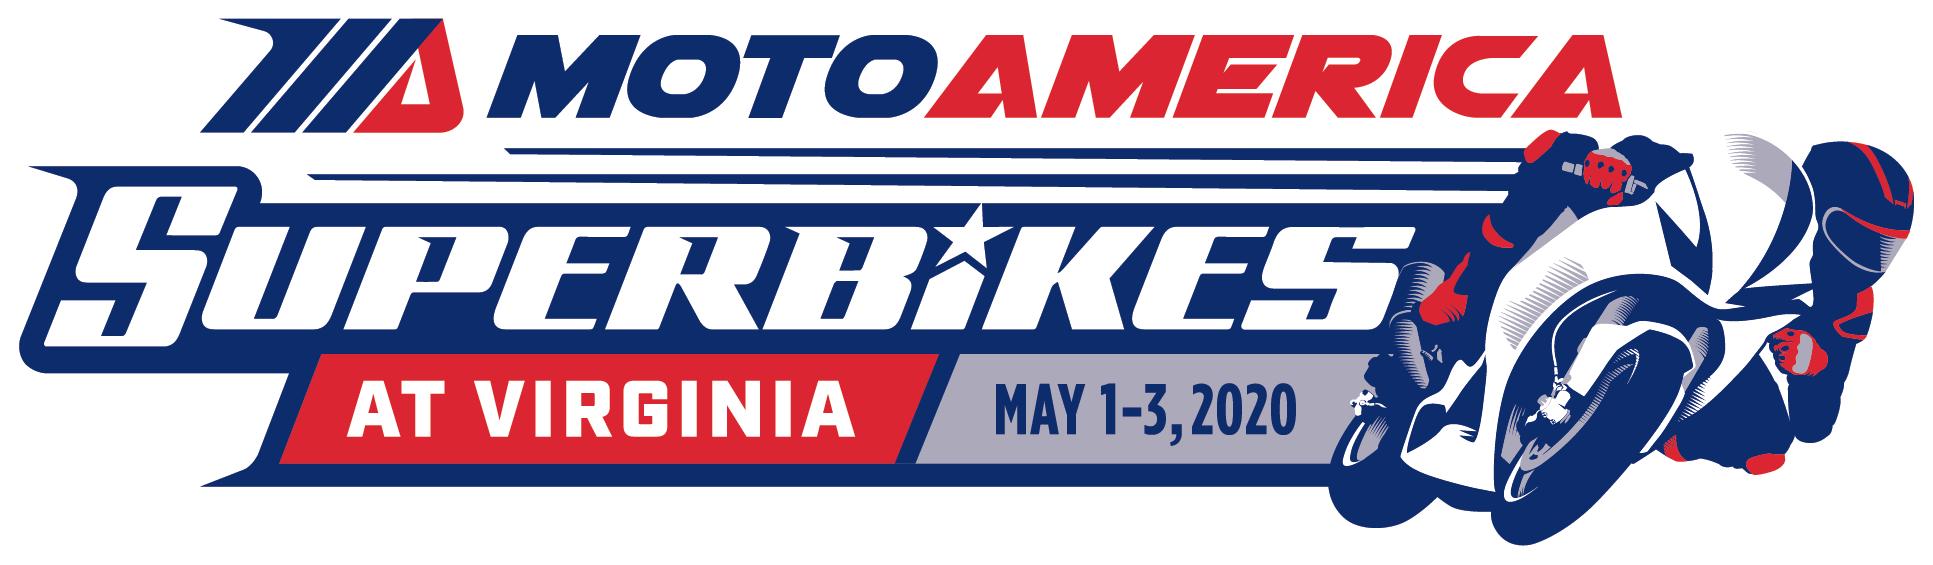 MotoAmerica Superbikes at Virginia - May 1-3, 2020